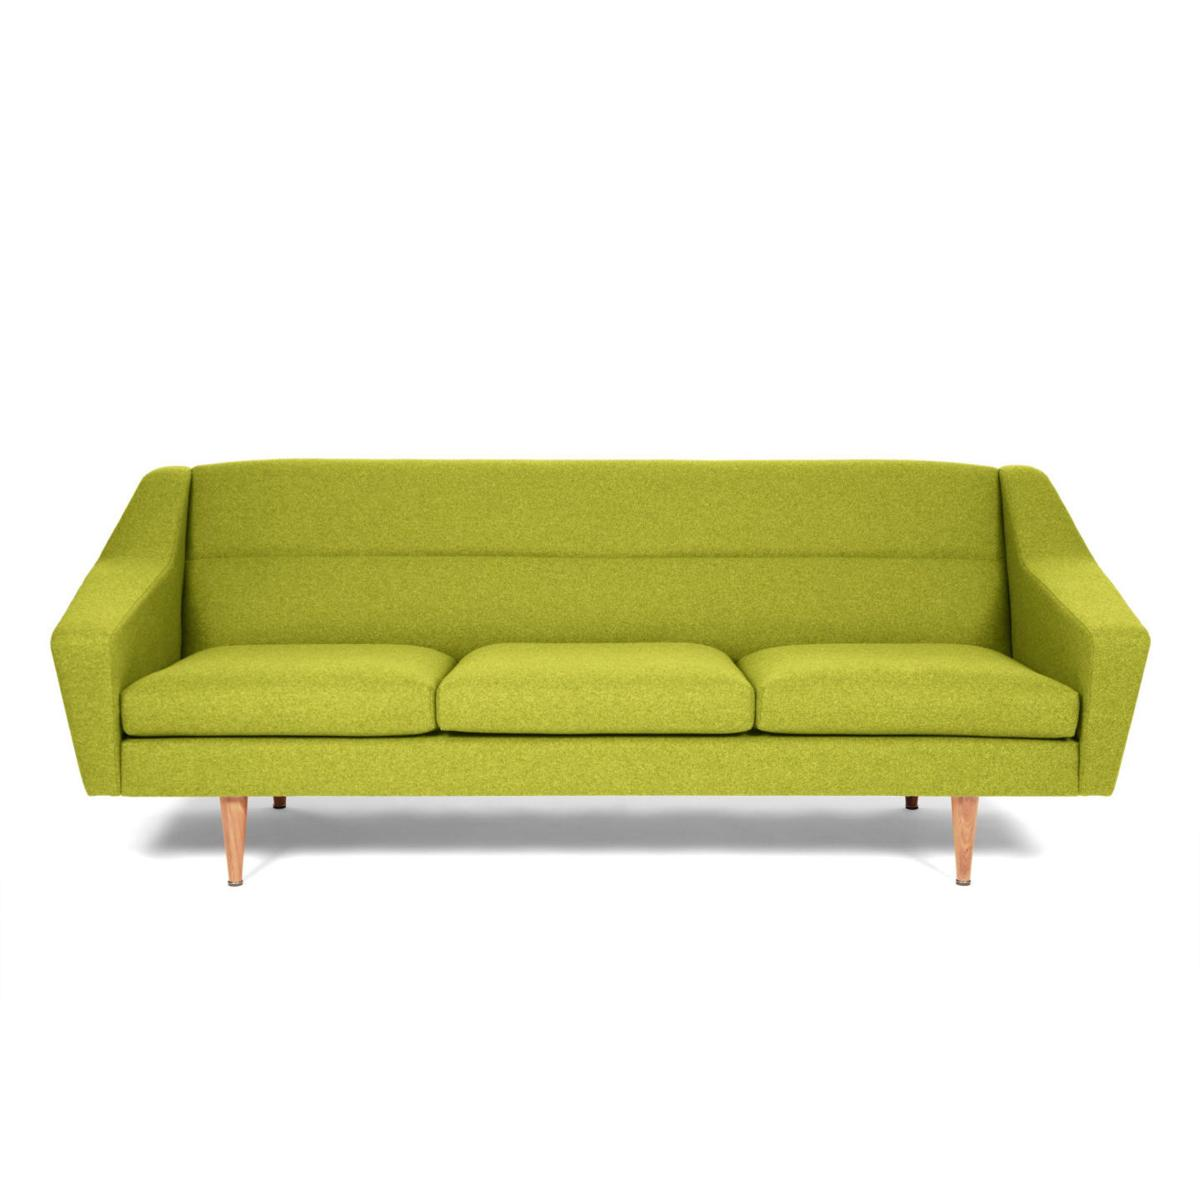 fall-hues-lime-green-sofa.jpg